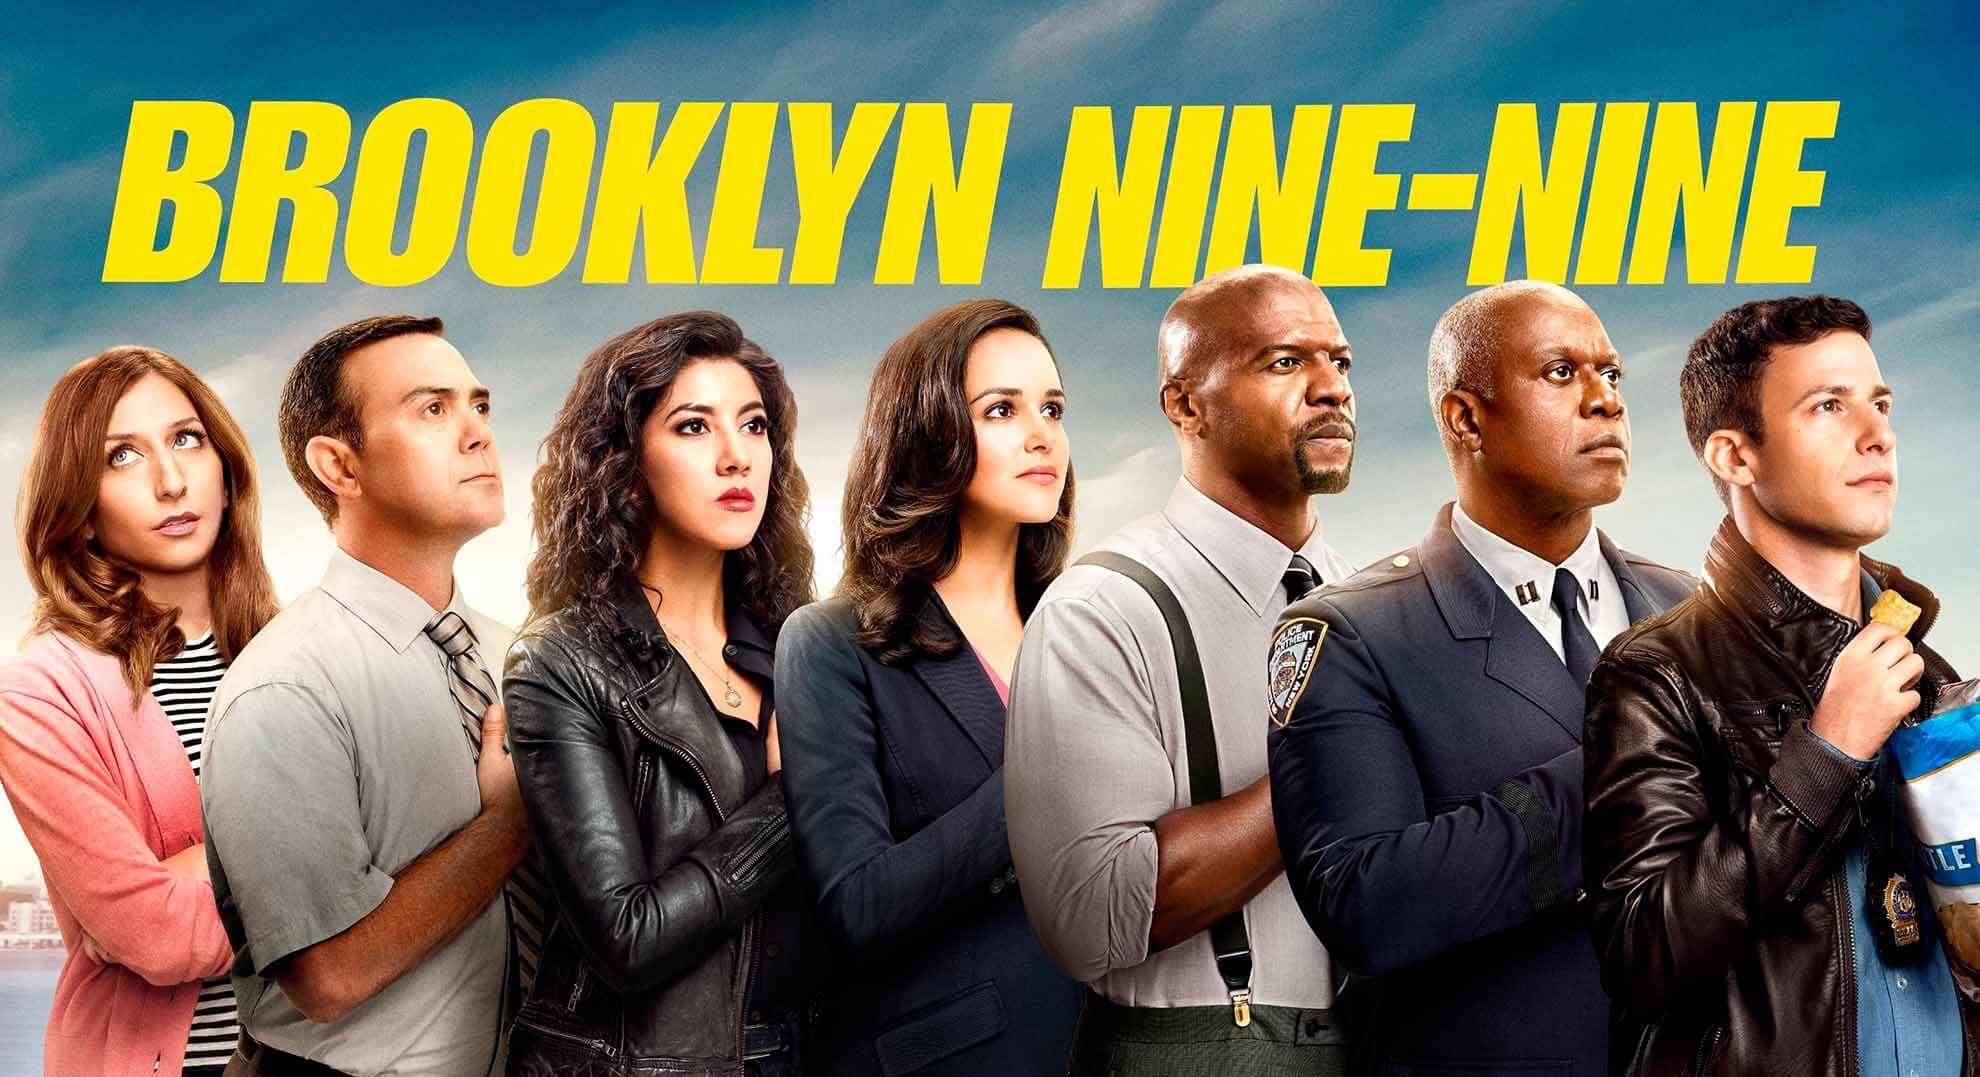 Brooklyn Nine-Nine Season 8 Is Getting Big Changes - TV